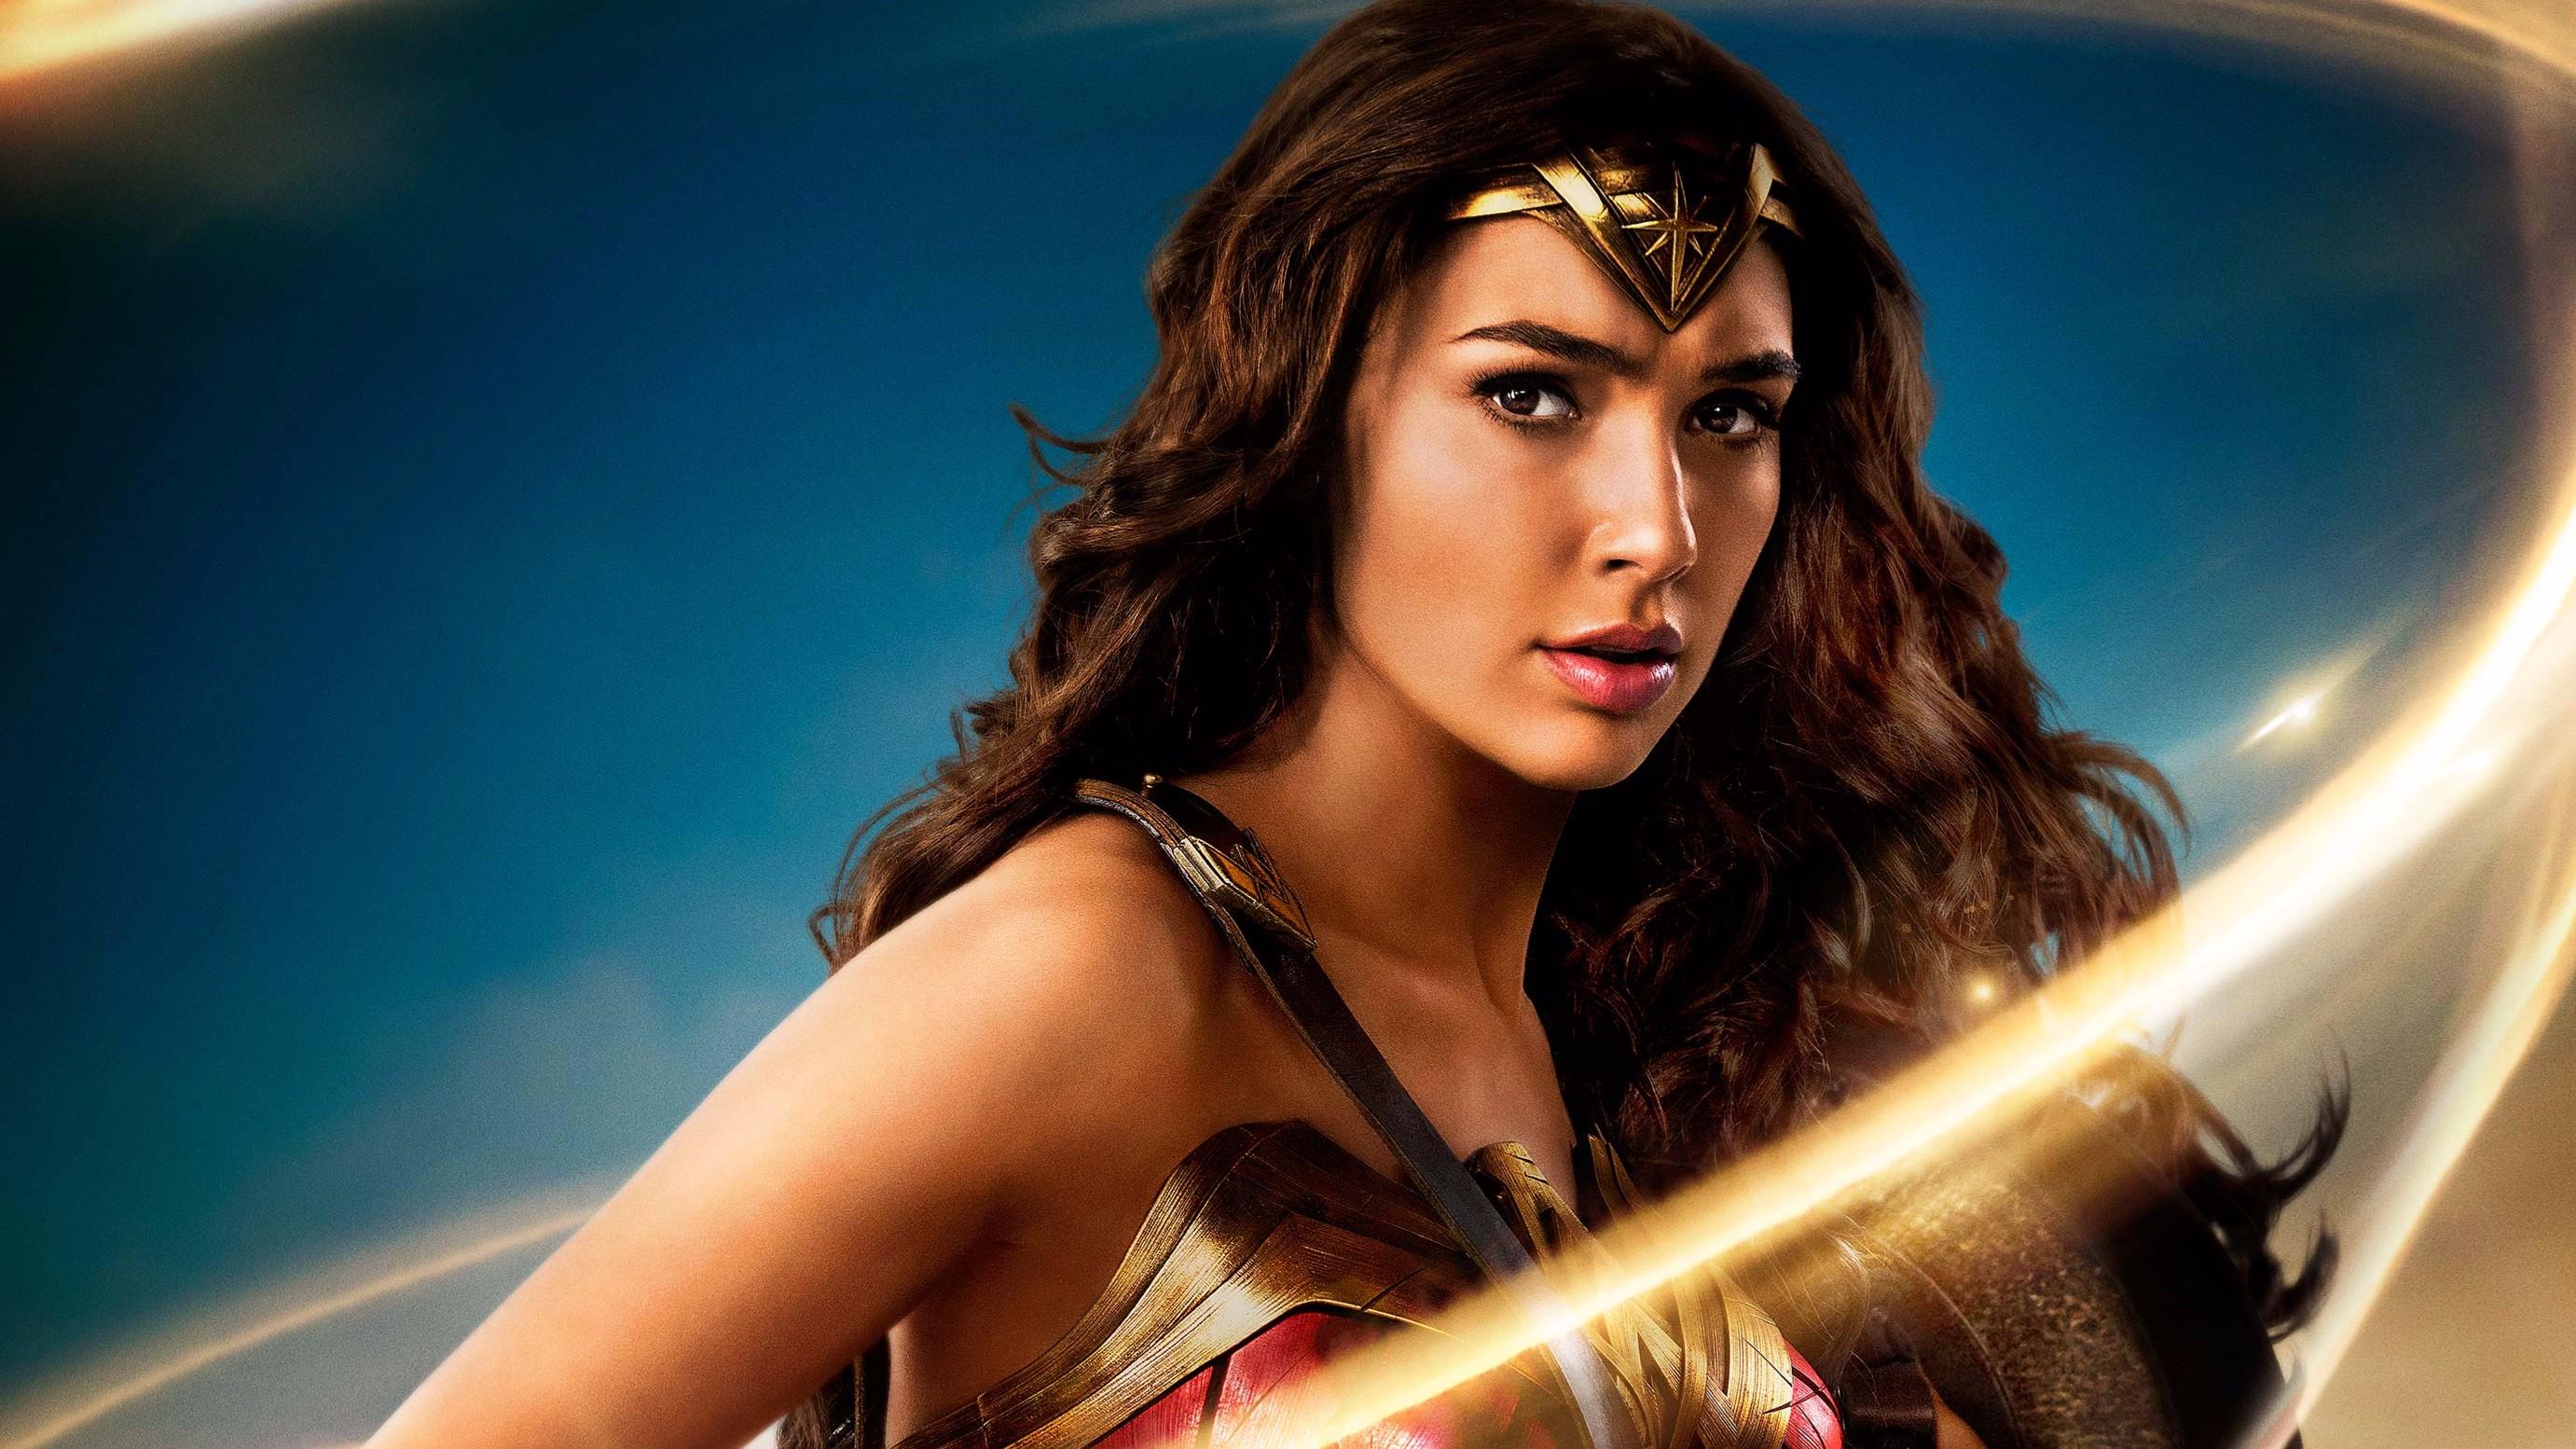 Gal Gadot Wonder Woman Poster - F